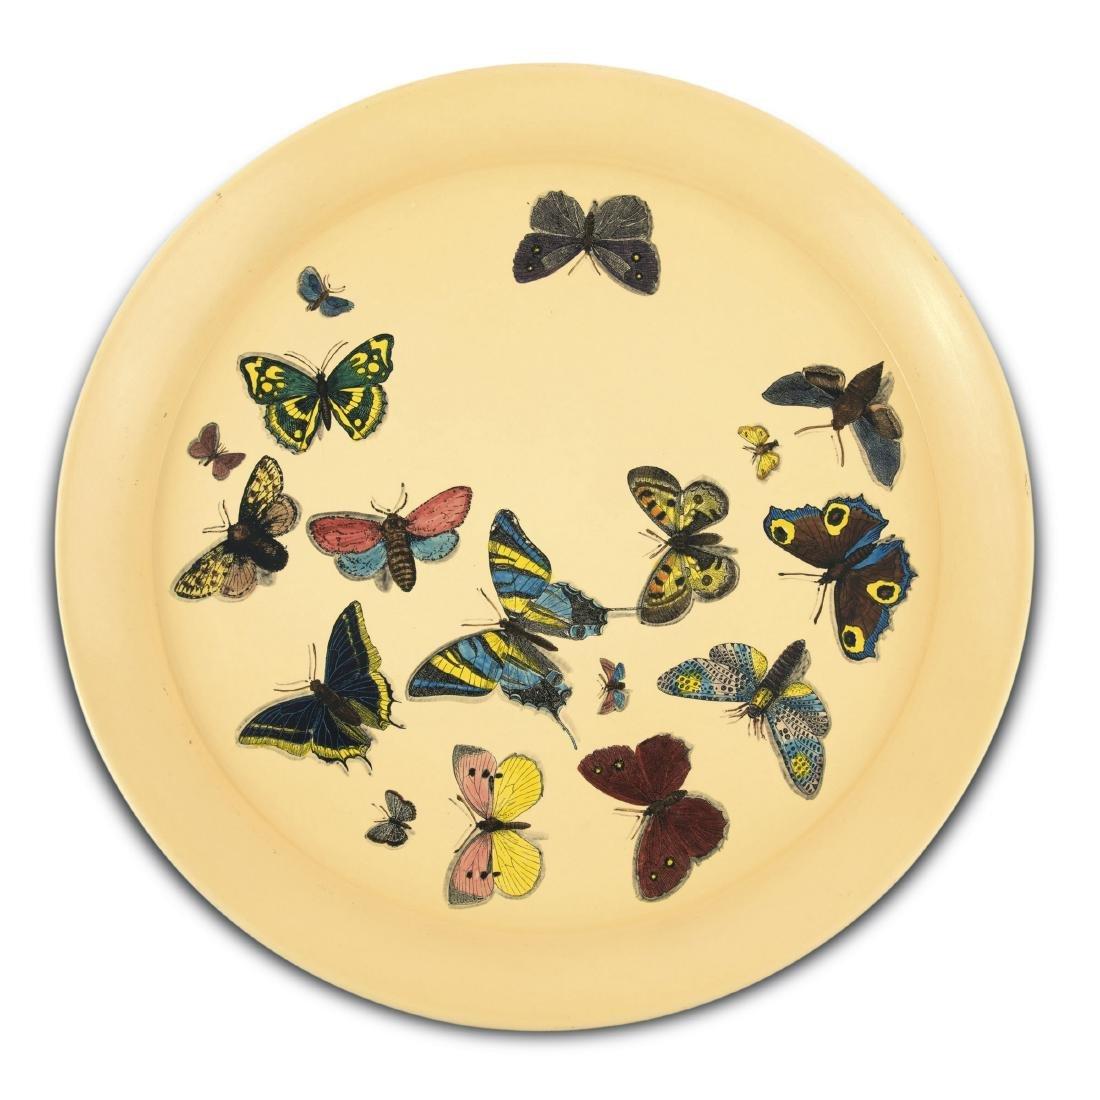 'Farfalle bianco' tray, 1950/60s